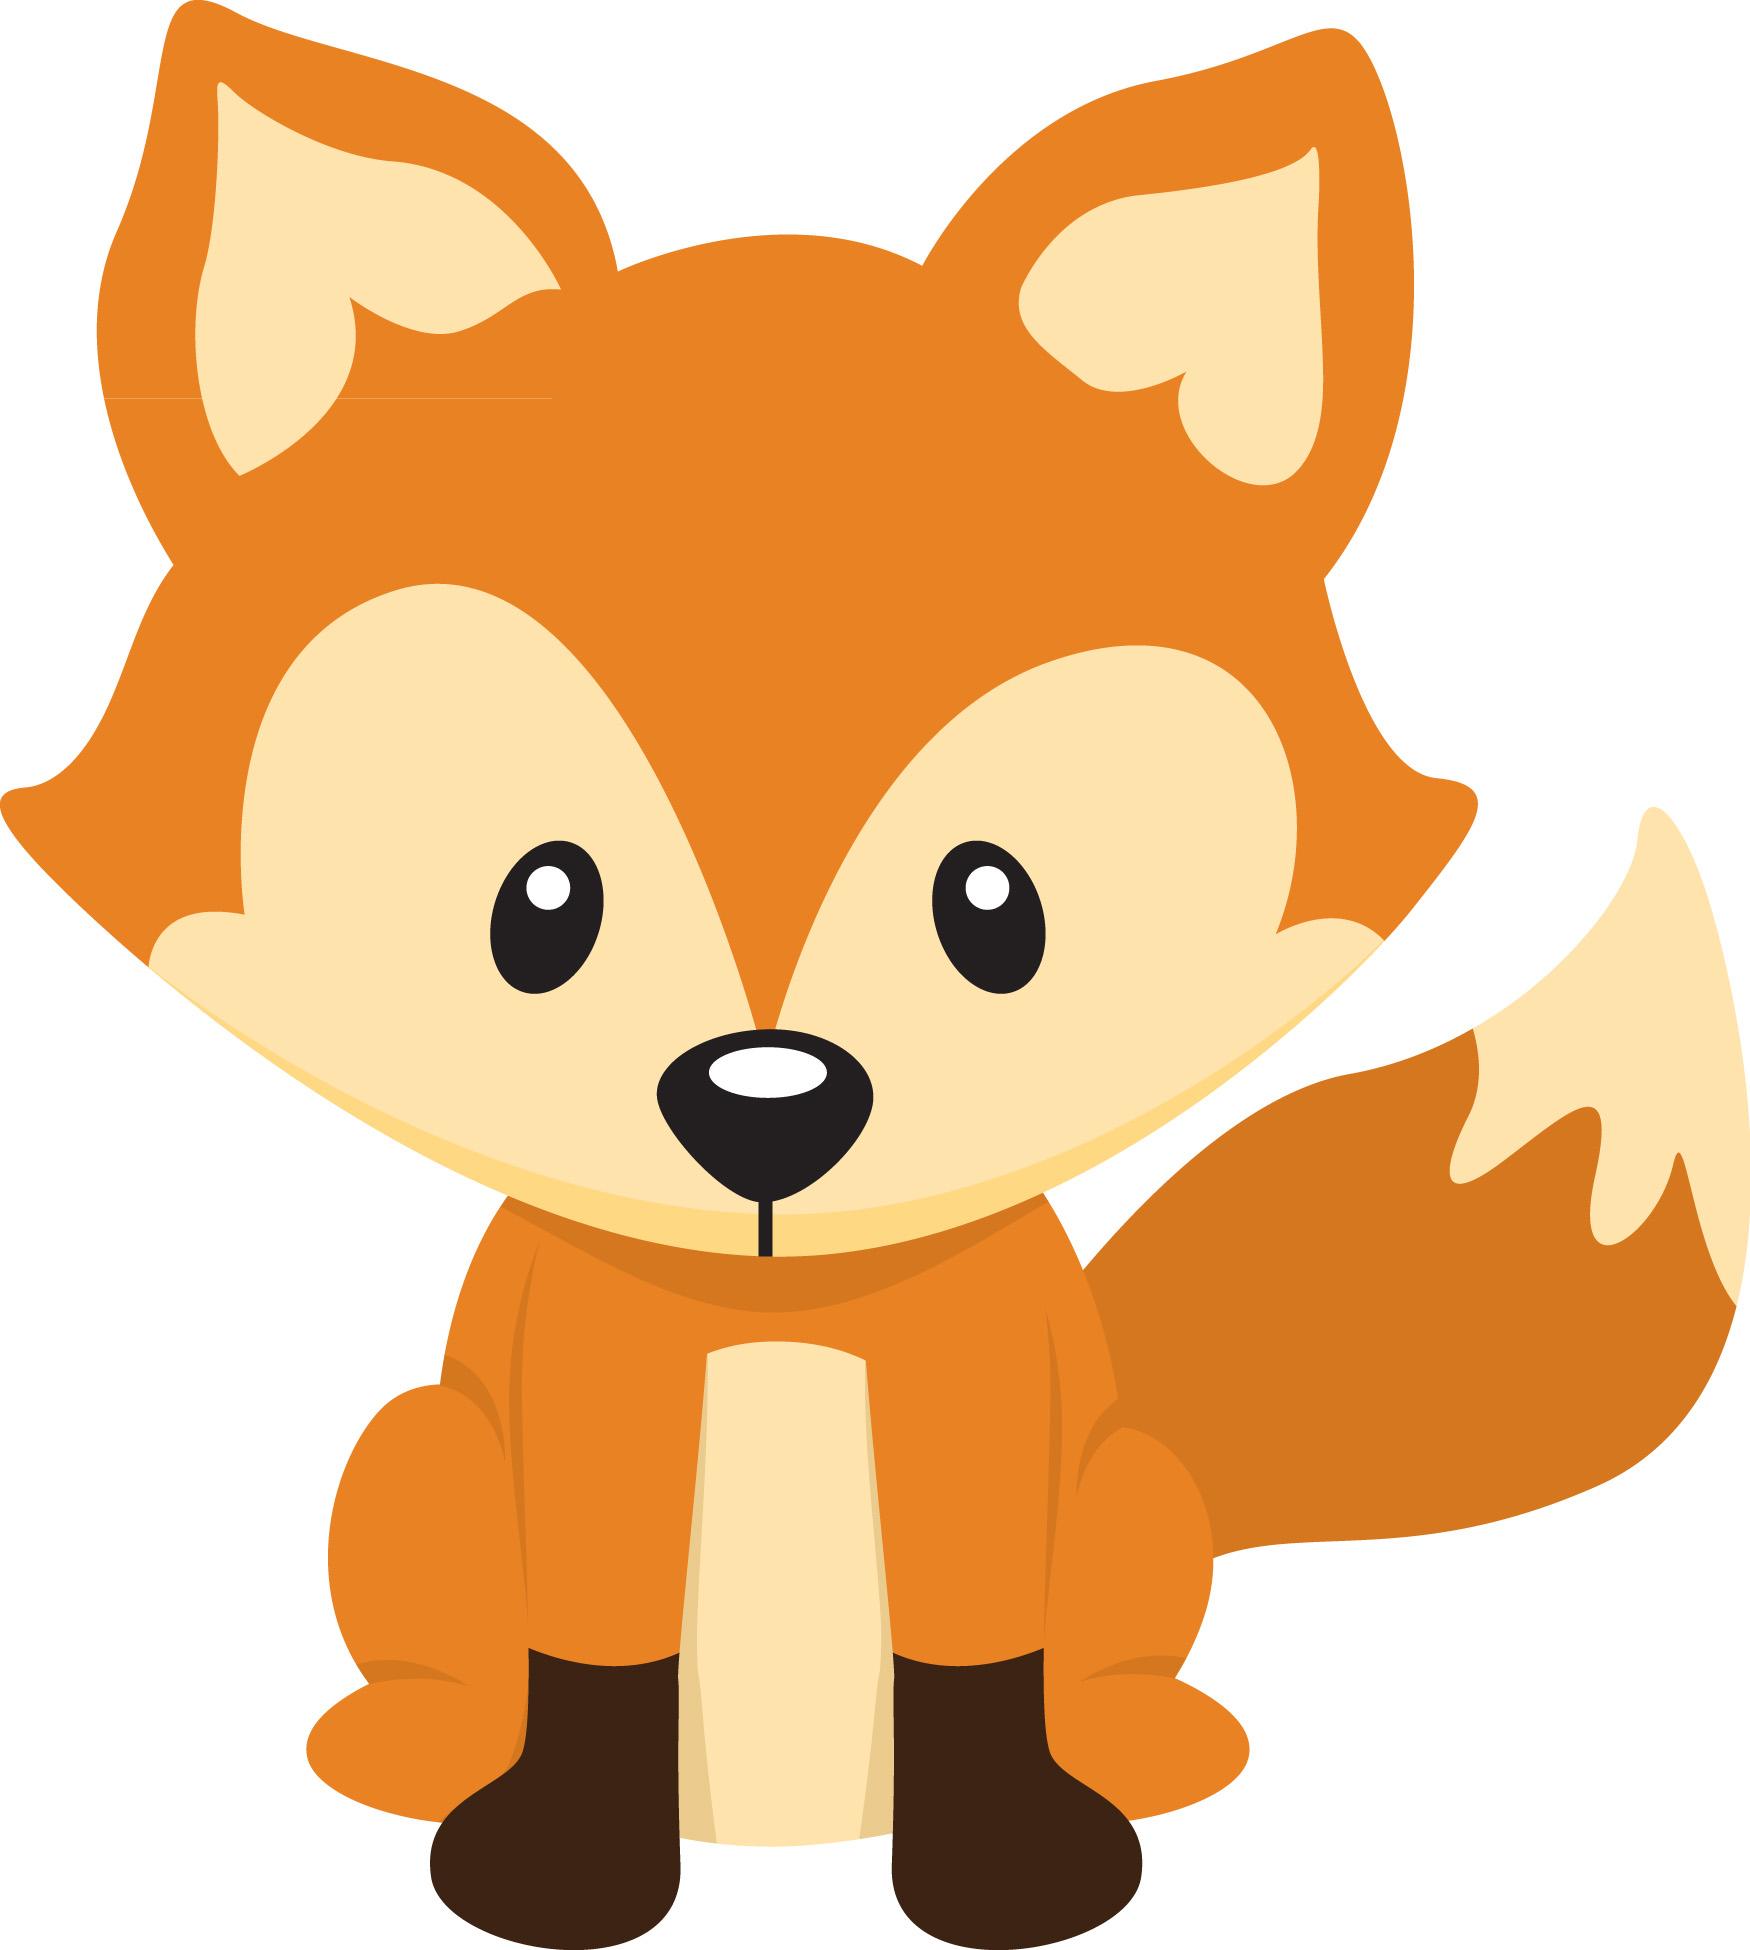 Fox clipart clipart cliparts for you-Fox clipart clipart cliparts for you-0